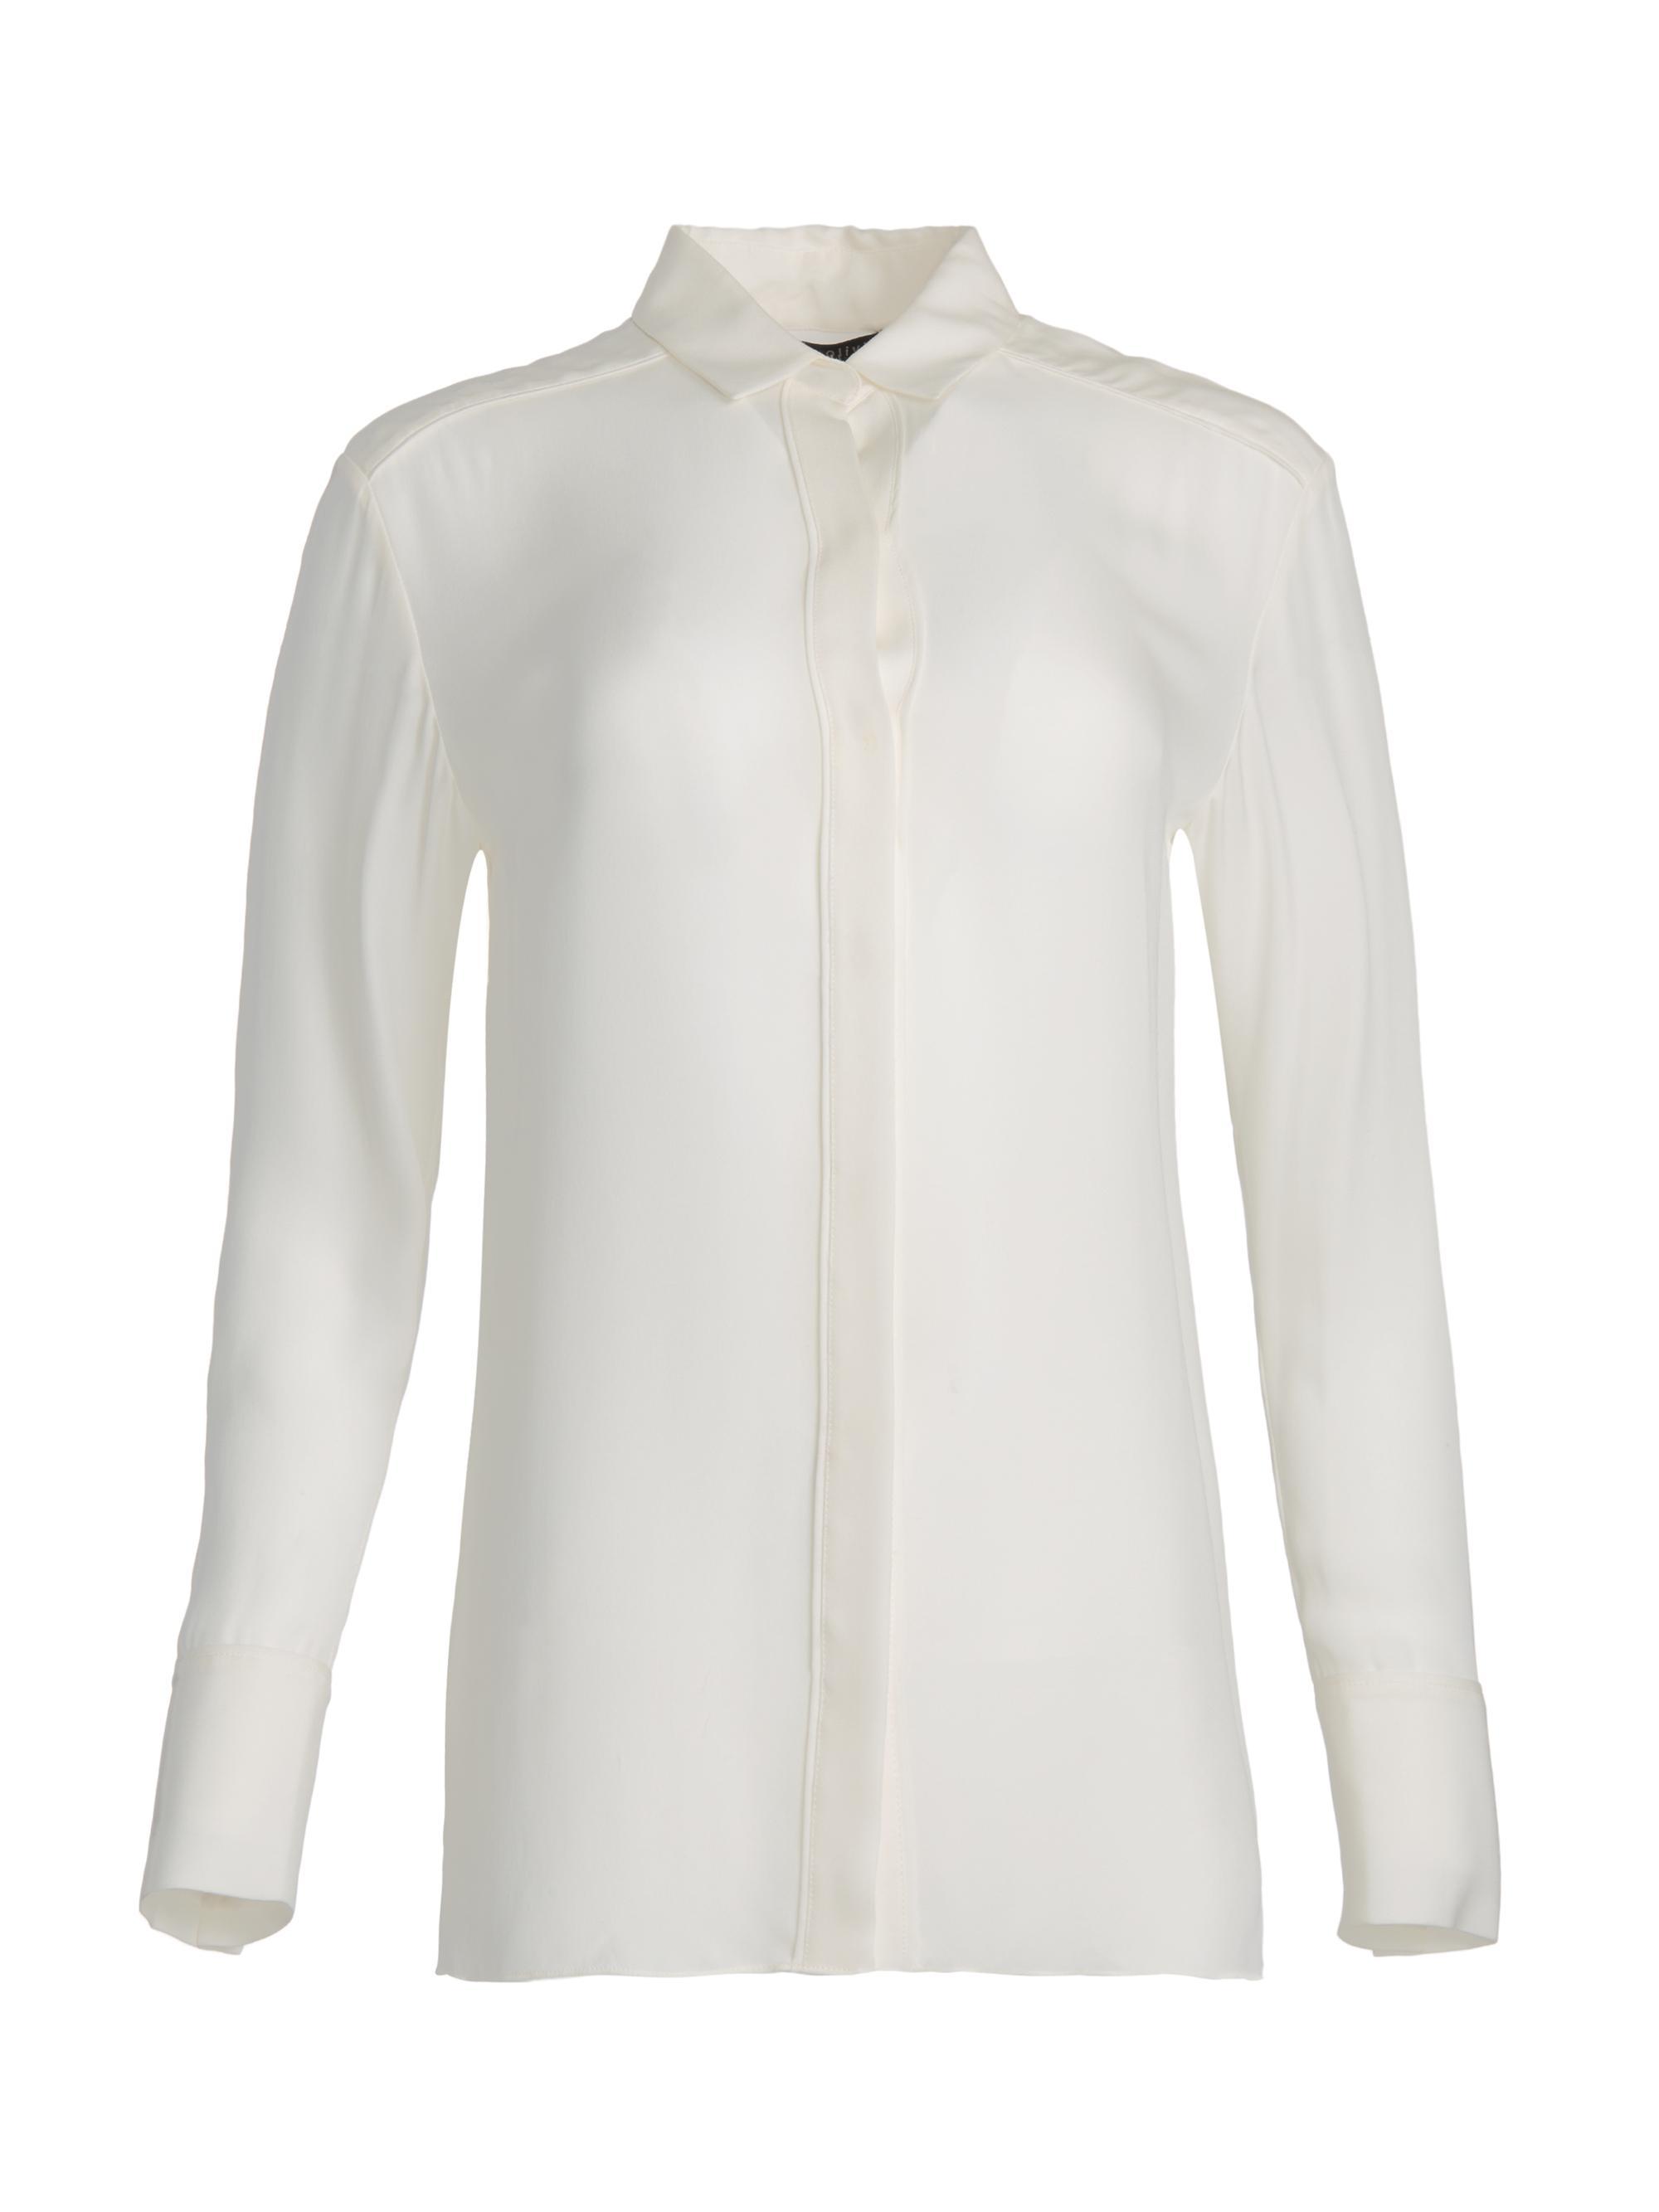 c66a93c13b0fb Lyst - Alice + Olivia Willa Small Collar Placket Top in White